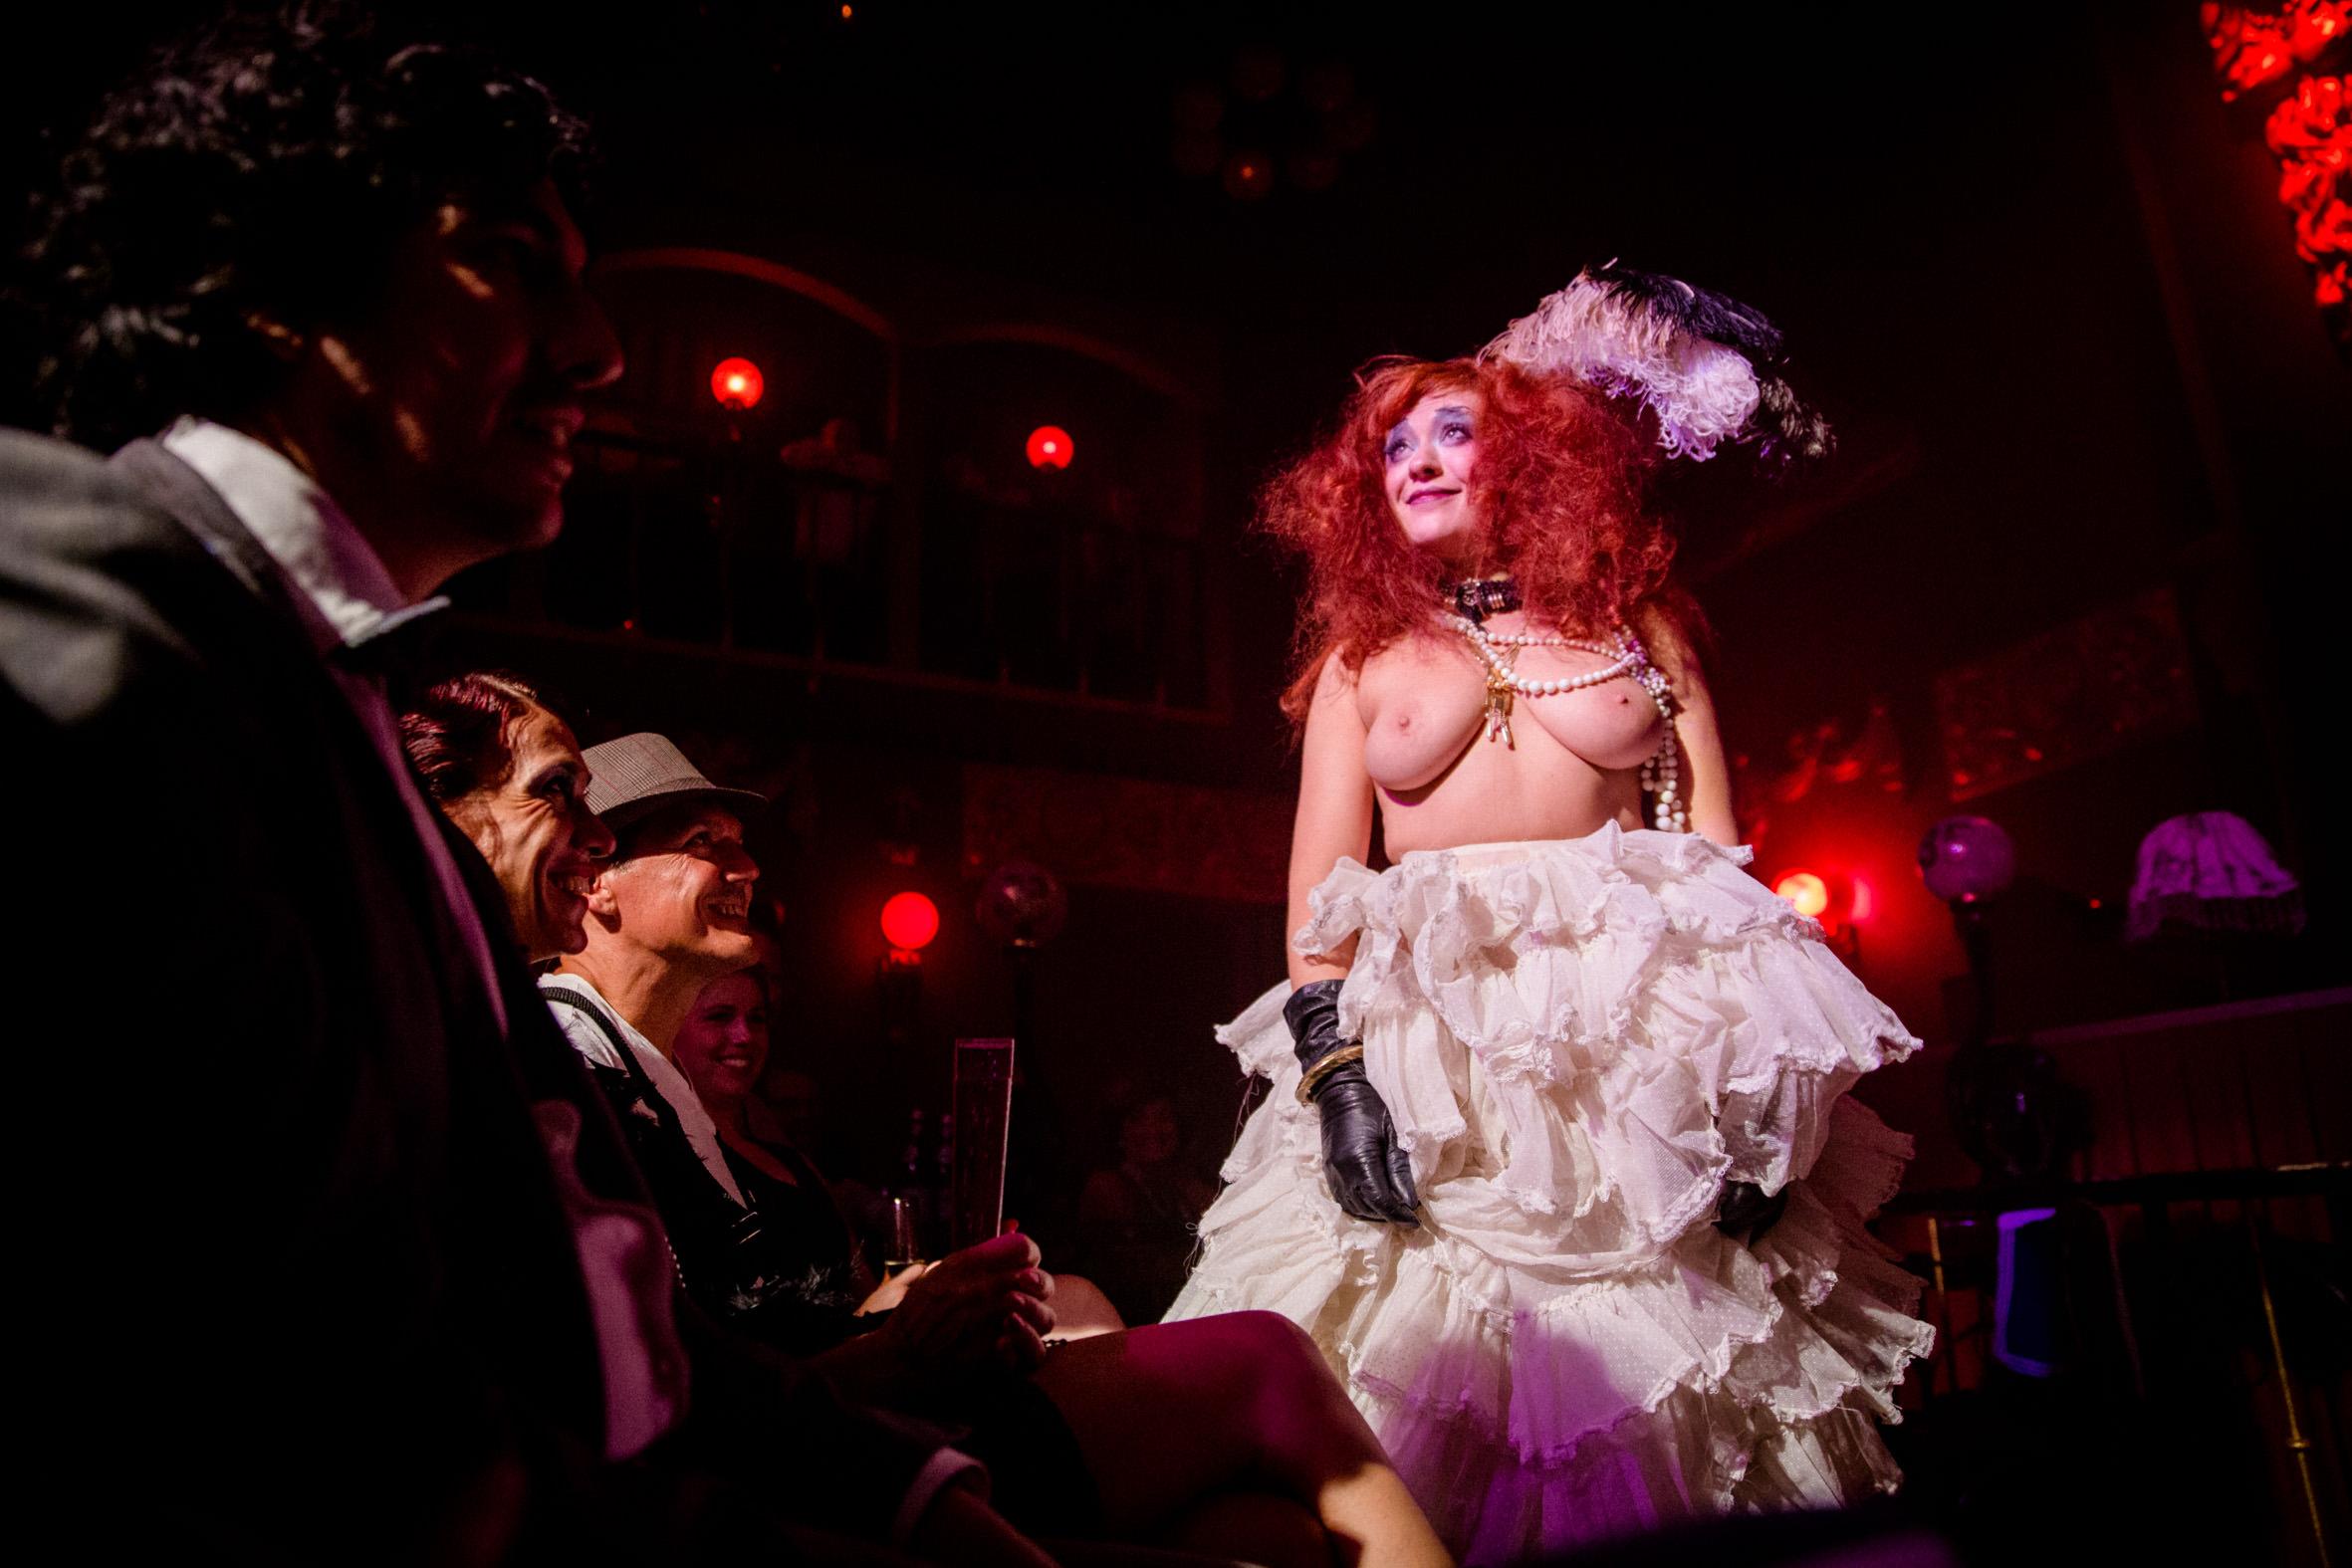 Le Pustra, Kabarett der Namenlosen, Berlin, Else Edelstahl, Ballhaus, Burlesque Fotograf, 20er Jahre, Eventfotos, Daggi Binder